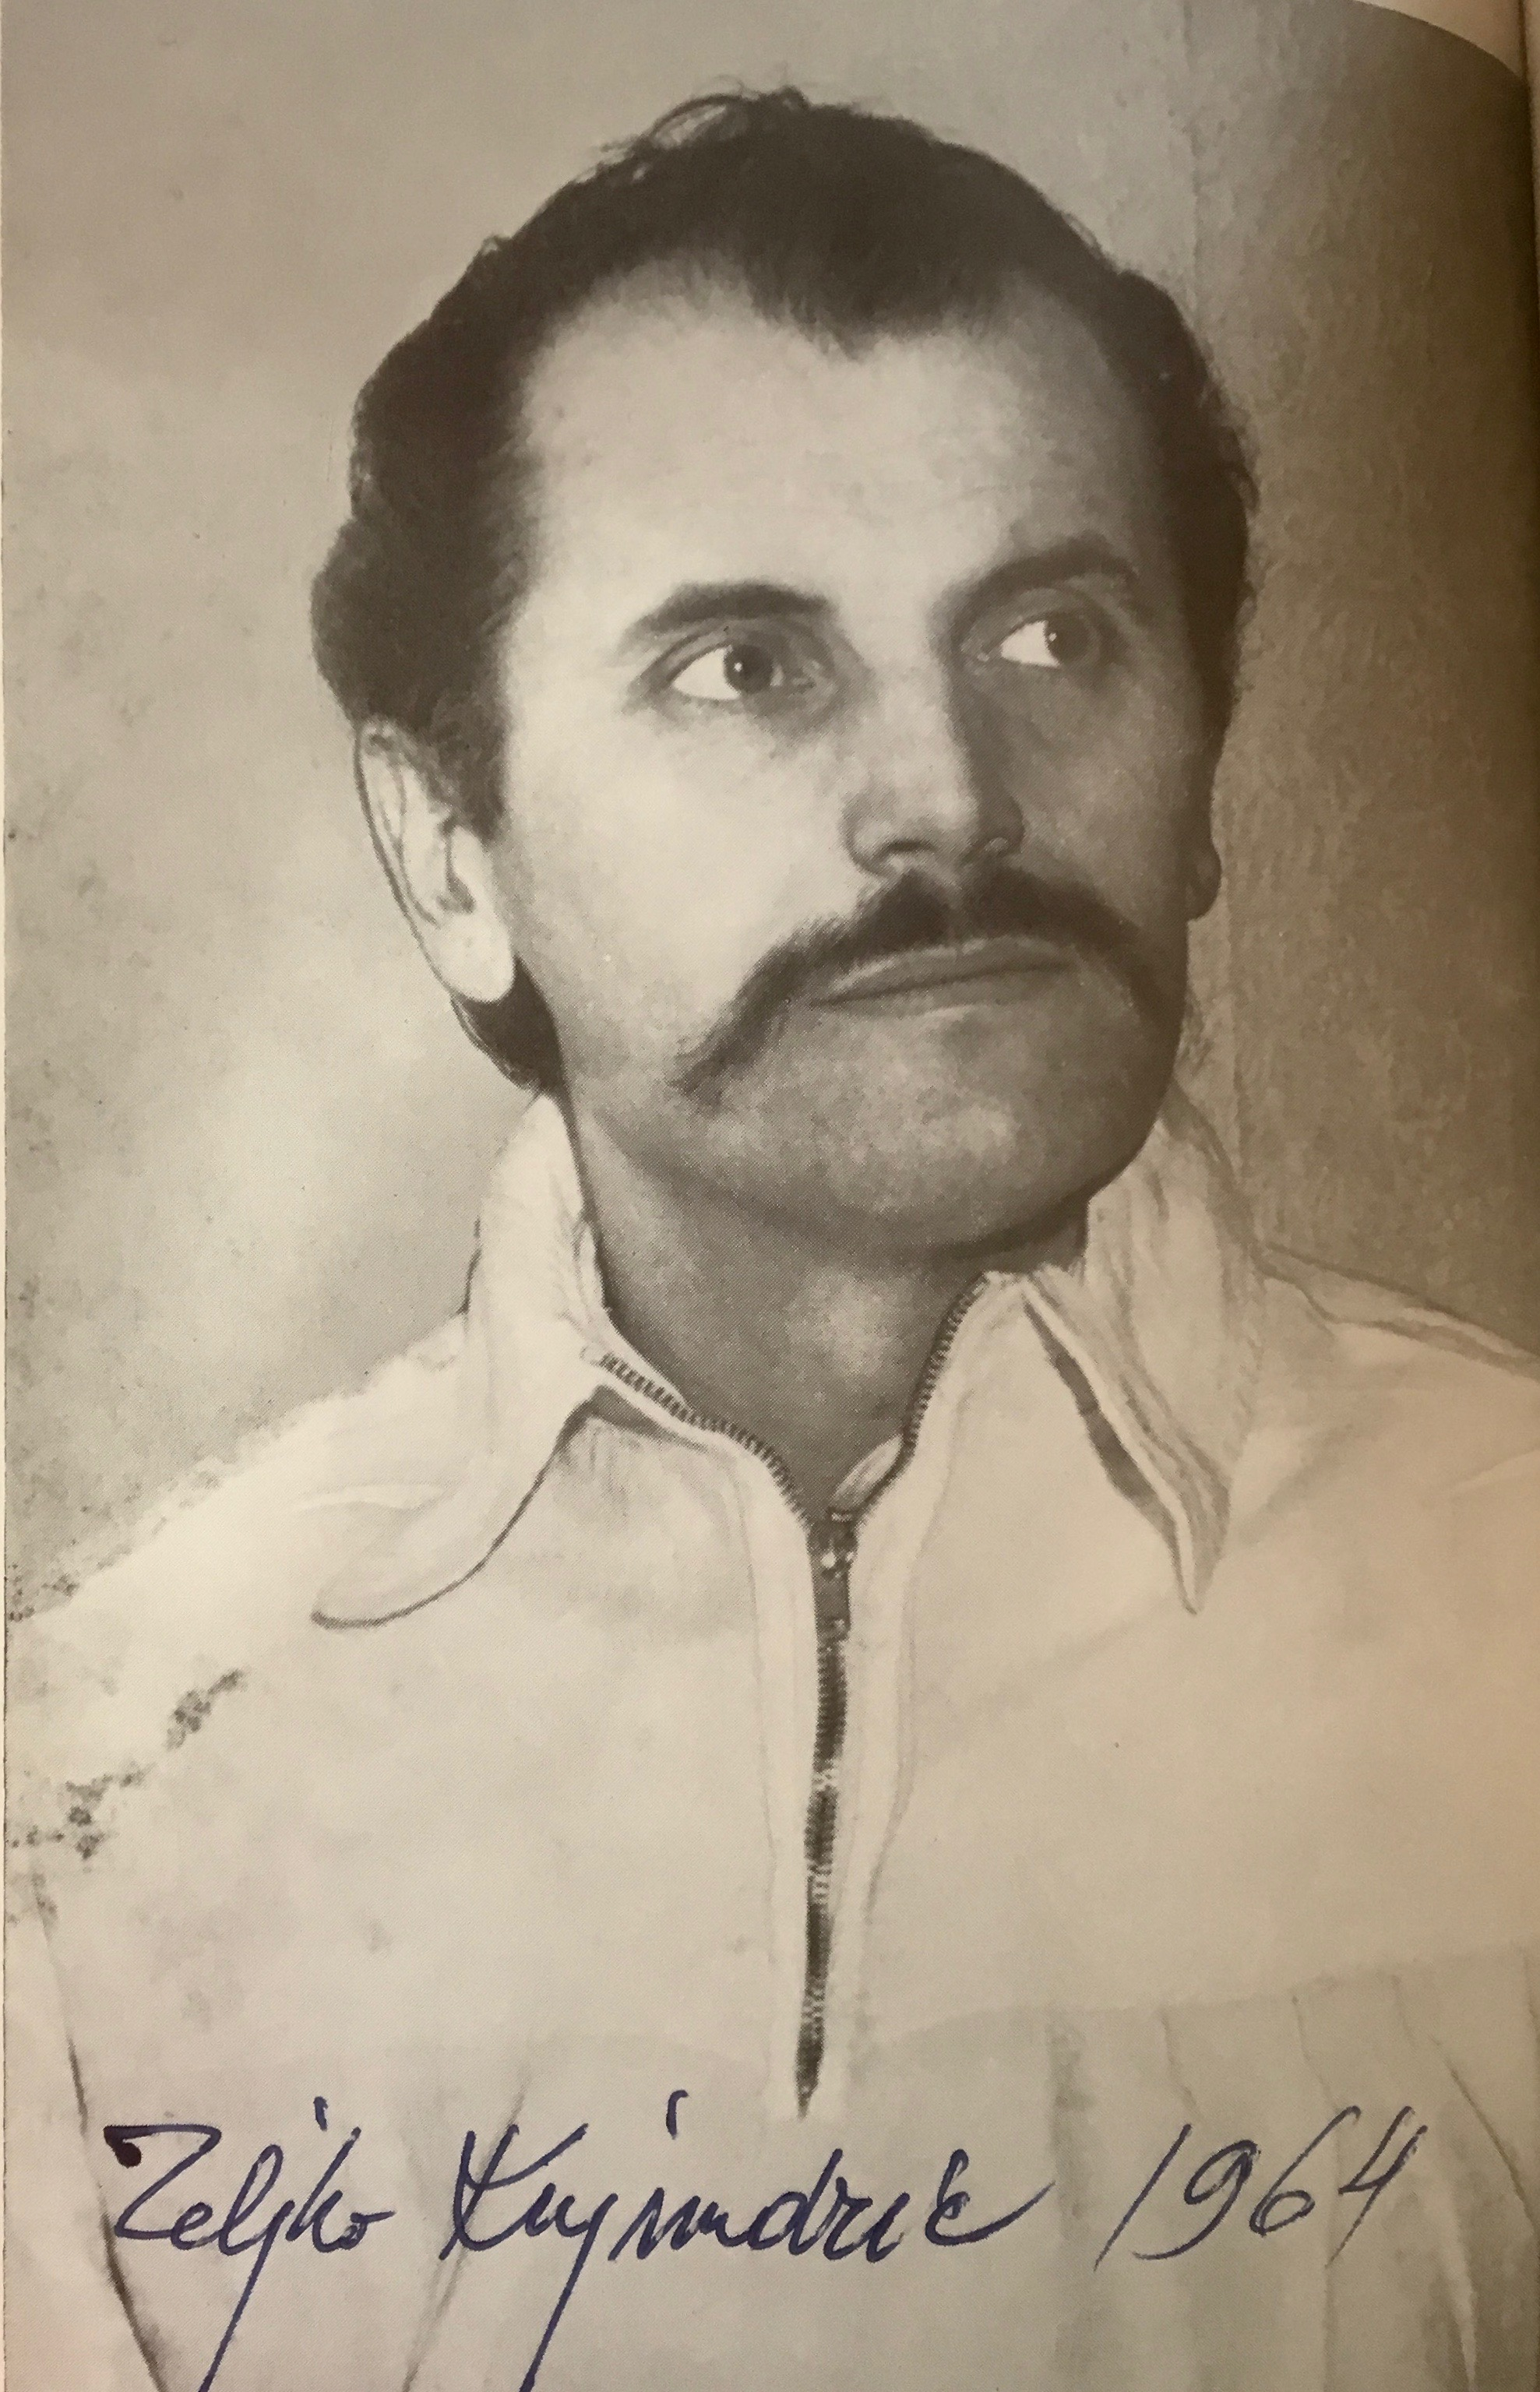 Zeljko Kujundzic